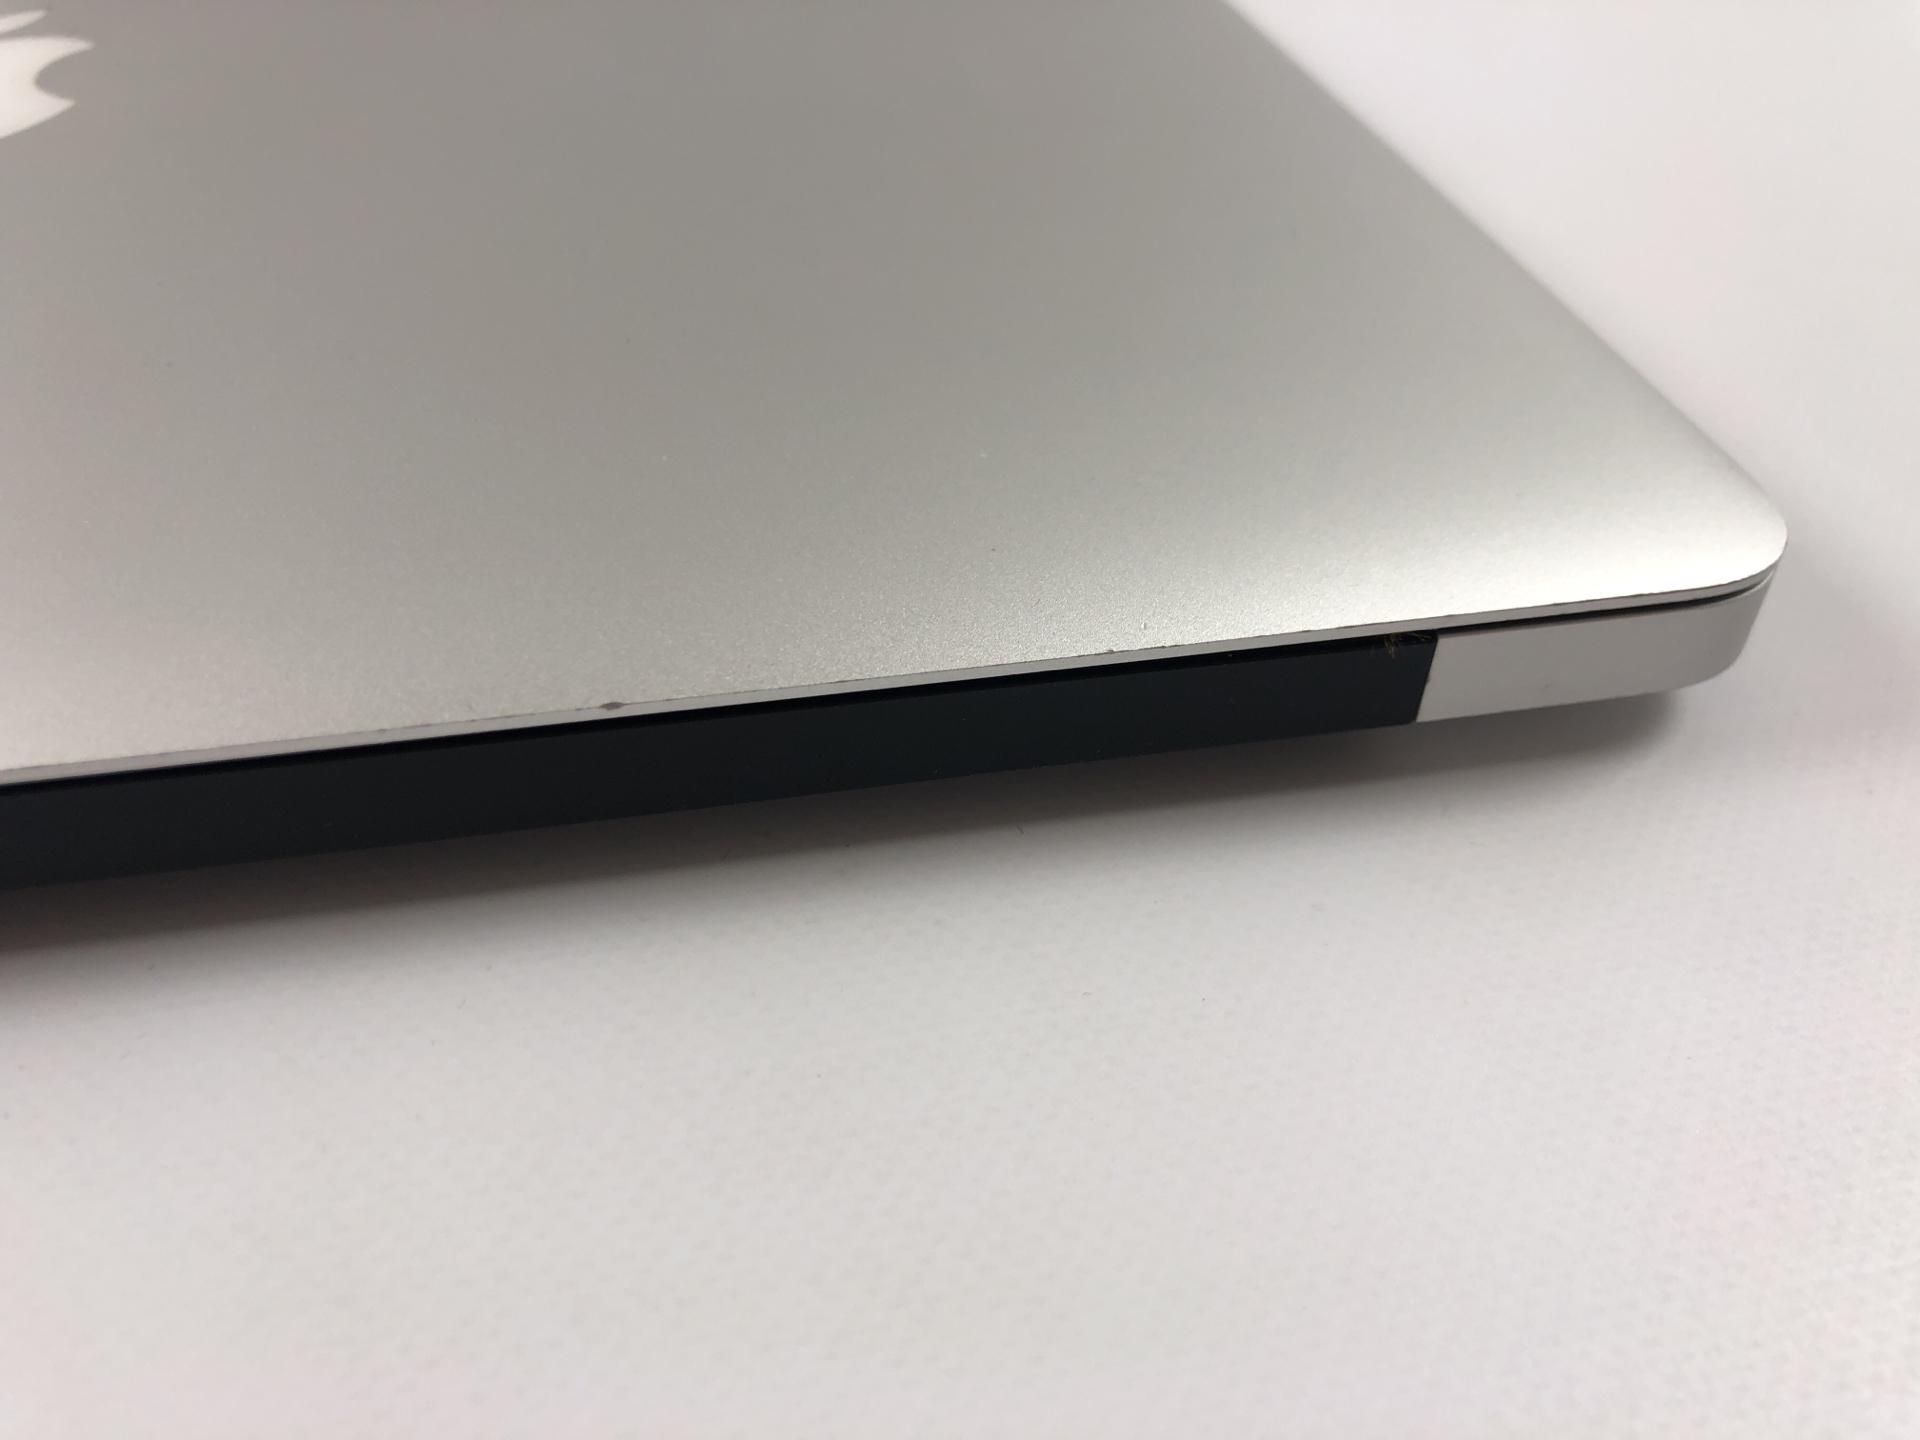 "MacBook Air 13"" Early 2015 (Intel Core i5 1.6 GHz 8 GB RAM 128 GB SSD), Intel Core i5 1.6 GHz, 8 GB RAM, 128 GB SSD, Afbeelding 3"